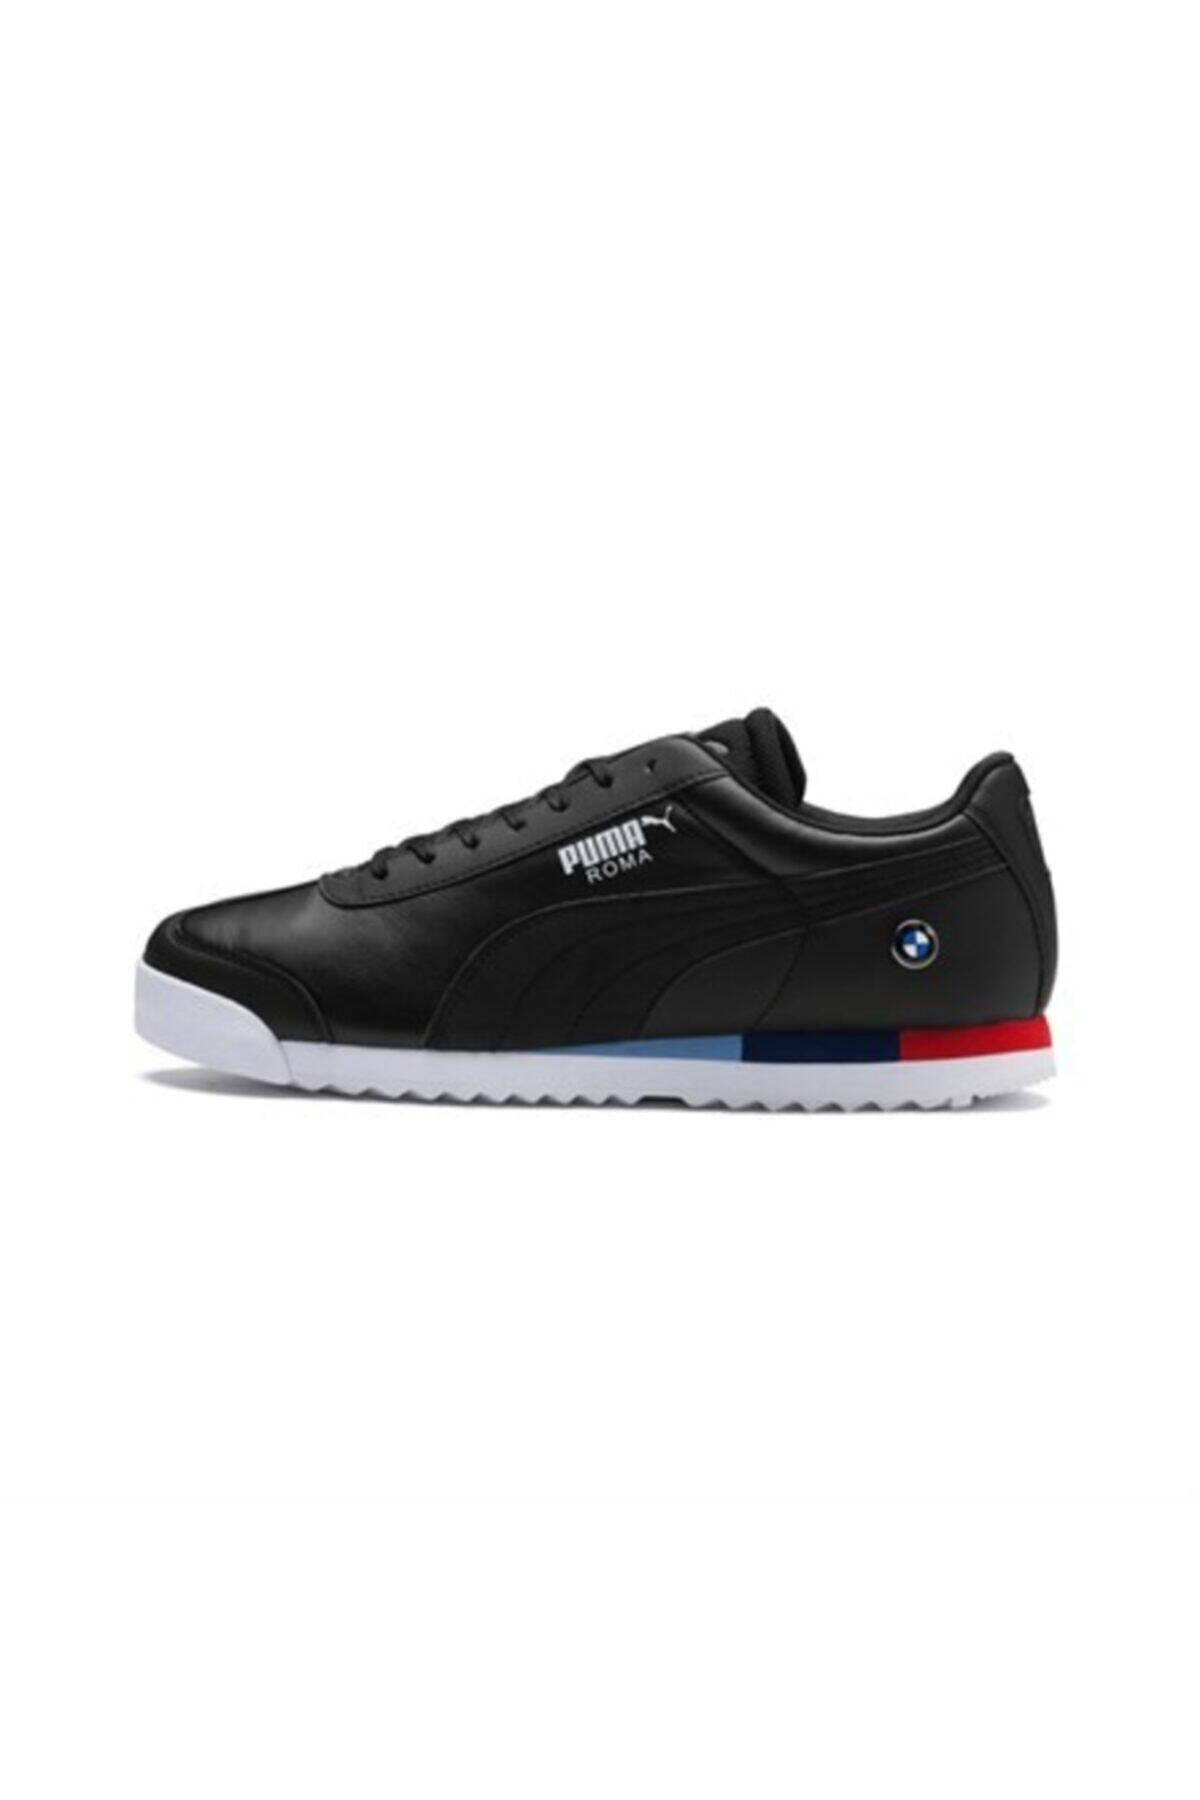 Puma Erkek Siyah Bmw Mms Roma Spor Ayakkabı 2